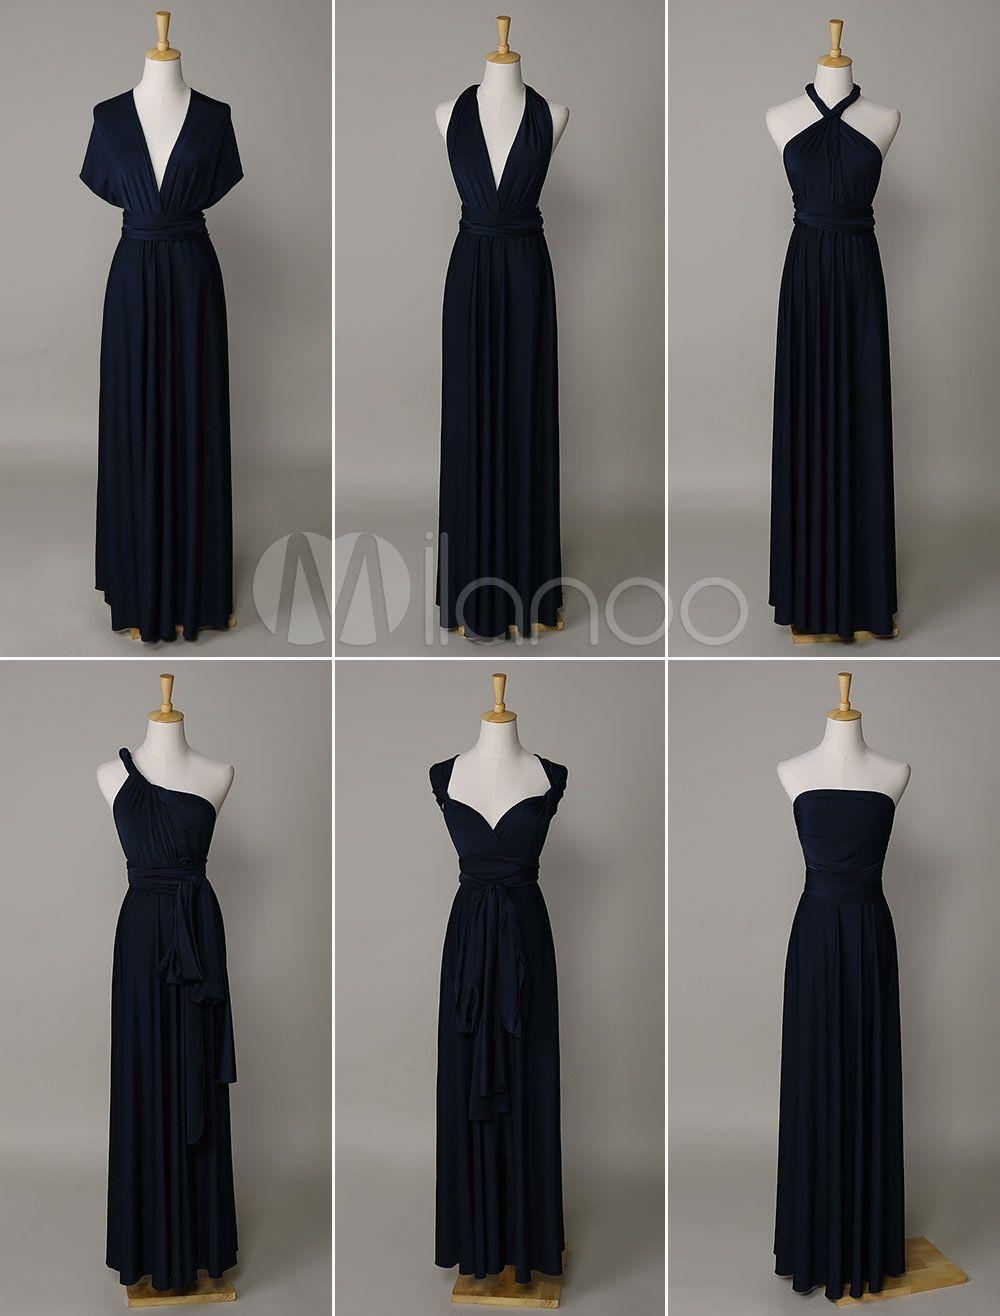 Convertible Evening Dress Navy Blue(convertible Infinity